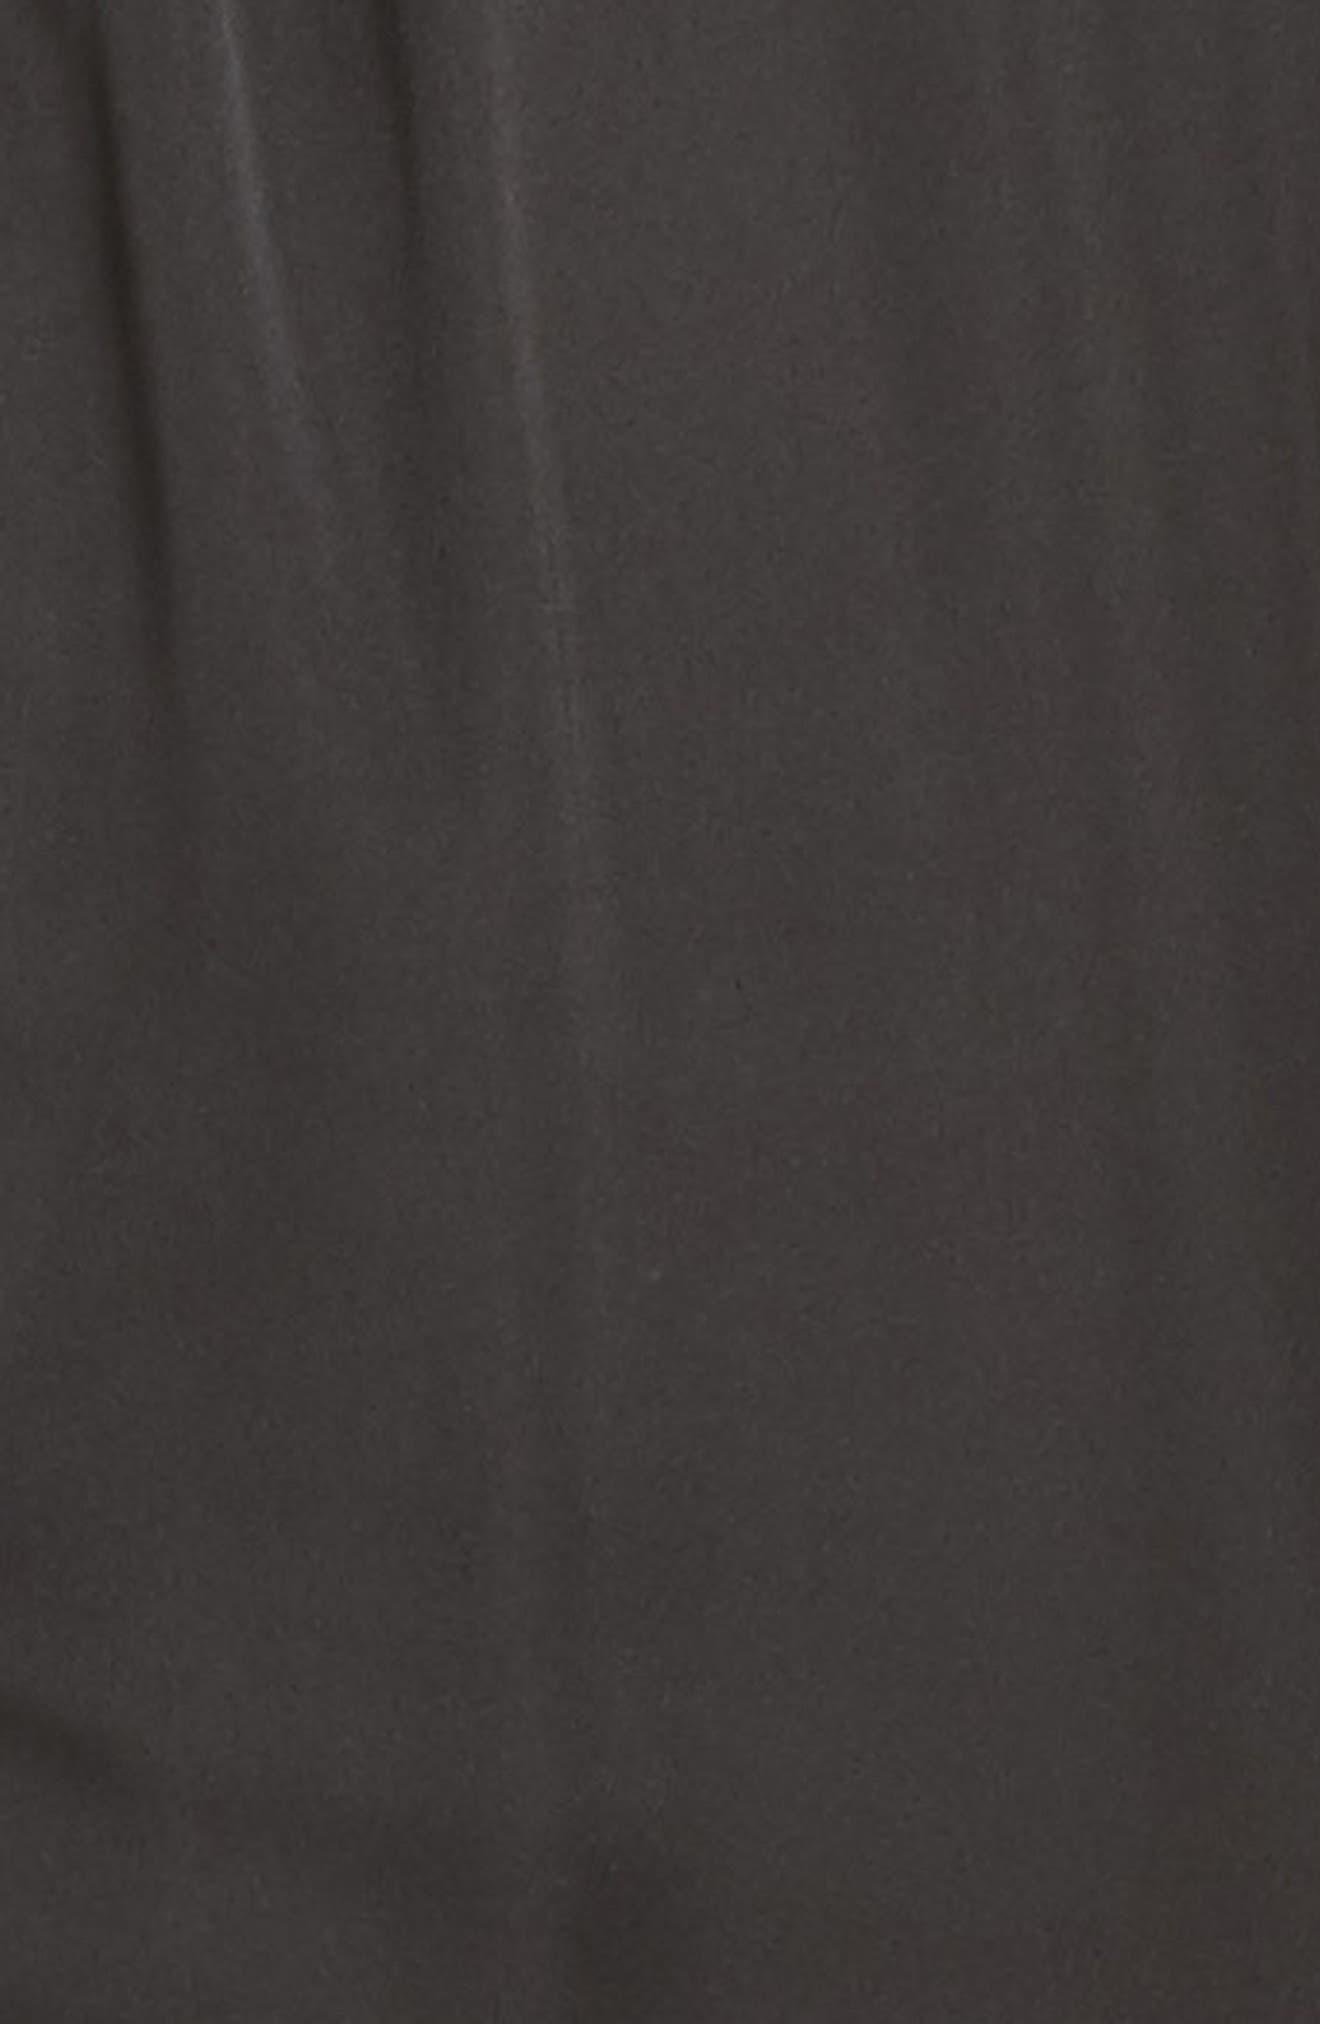 Abigail Secretary Satin Bodysuit,                             Alternate thumbnail 5, color,                             001